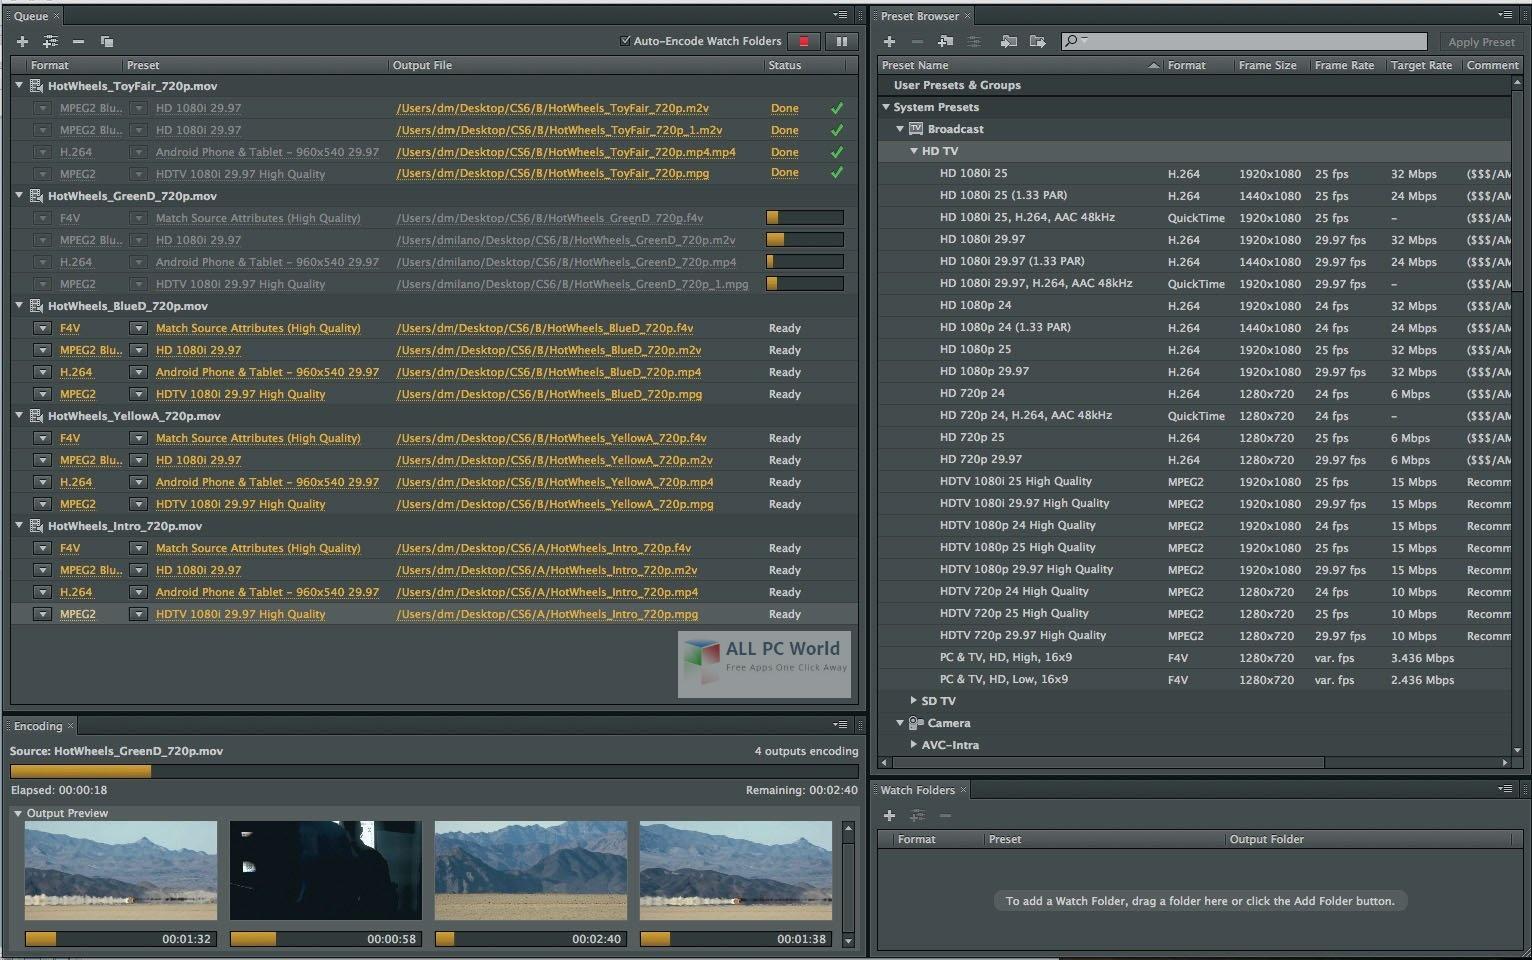 Adobe Media Encoder CC 2020 v14.0.4 for Windows 10